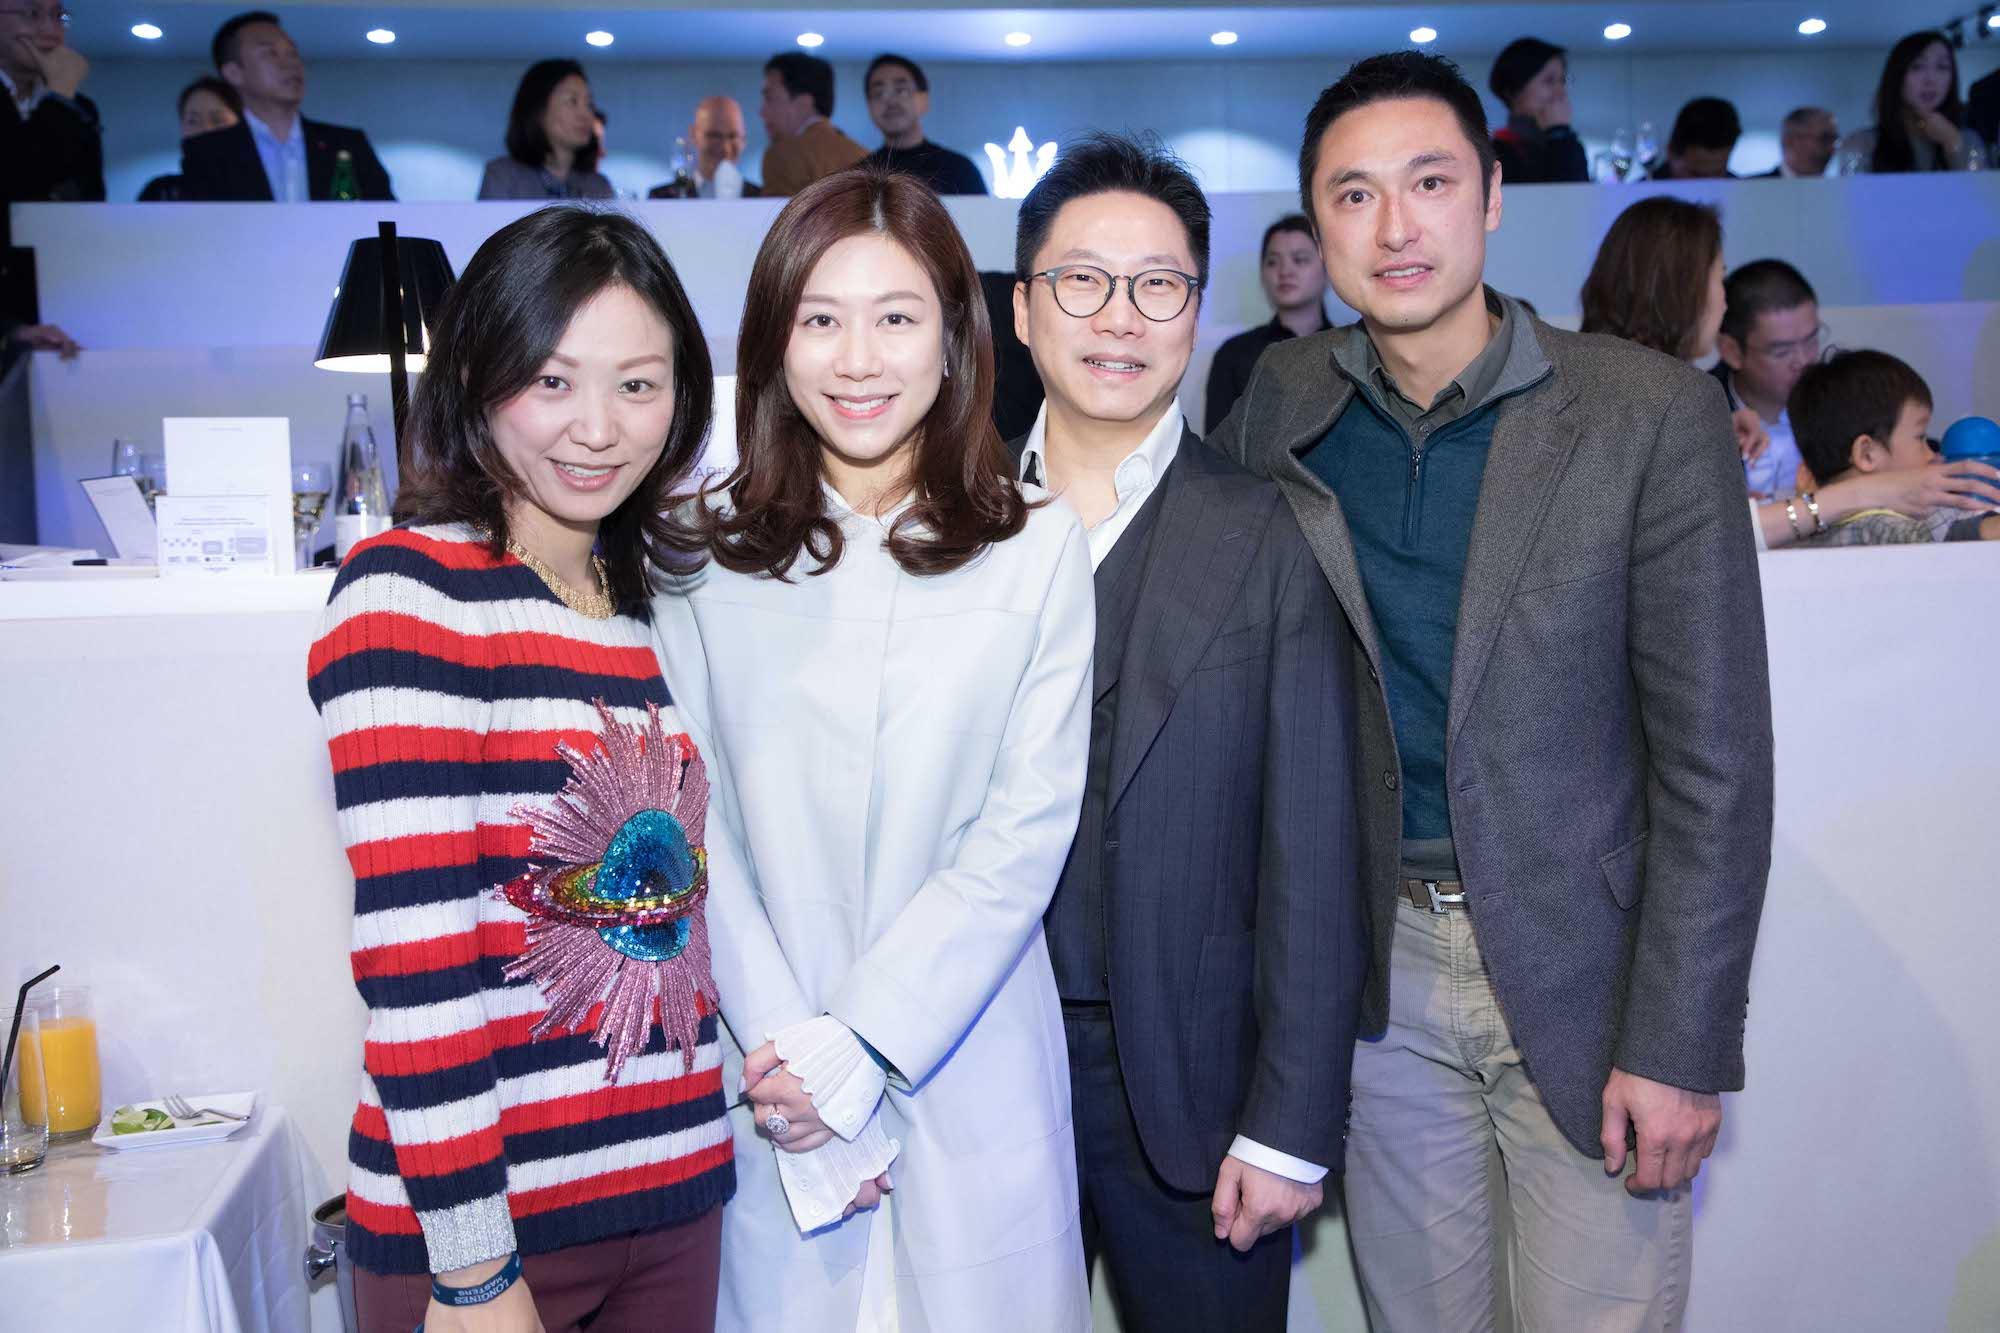 Michelle Cheng-Chan, Letty Ngan, Roger Ngan, Alan Chan